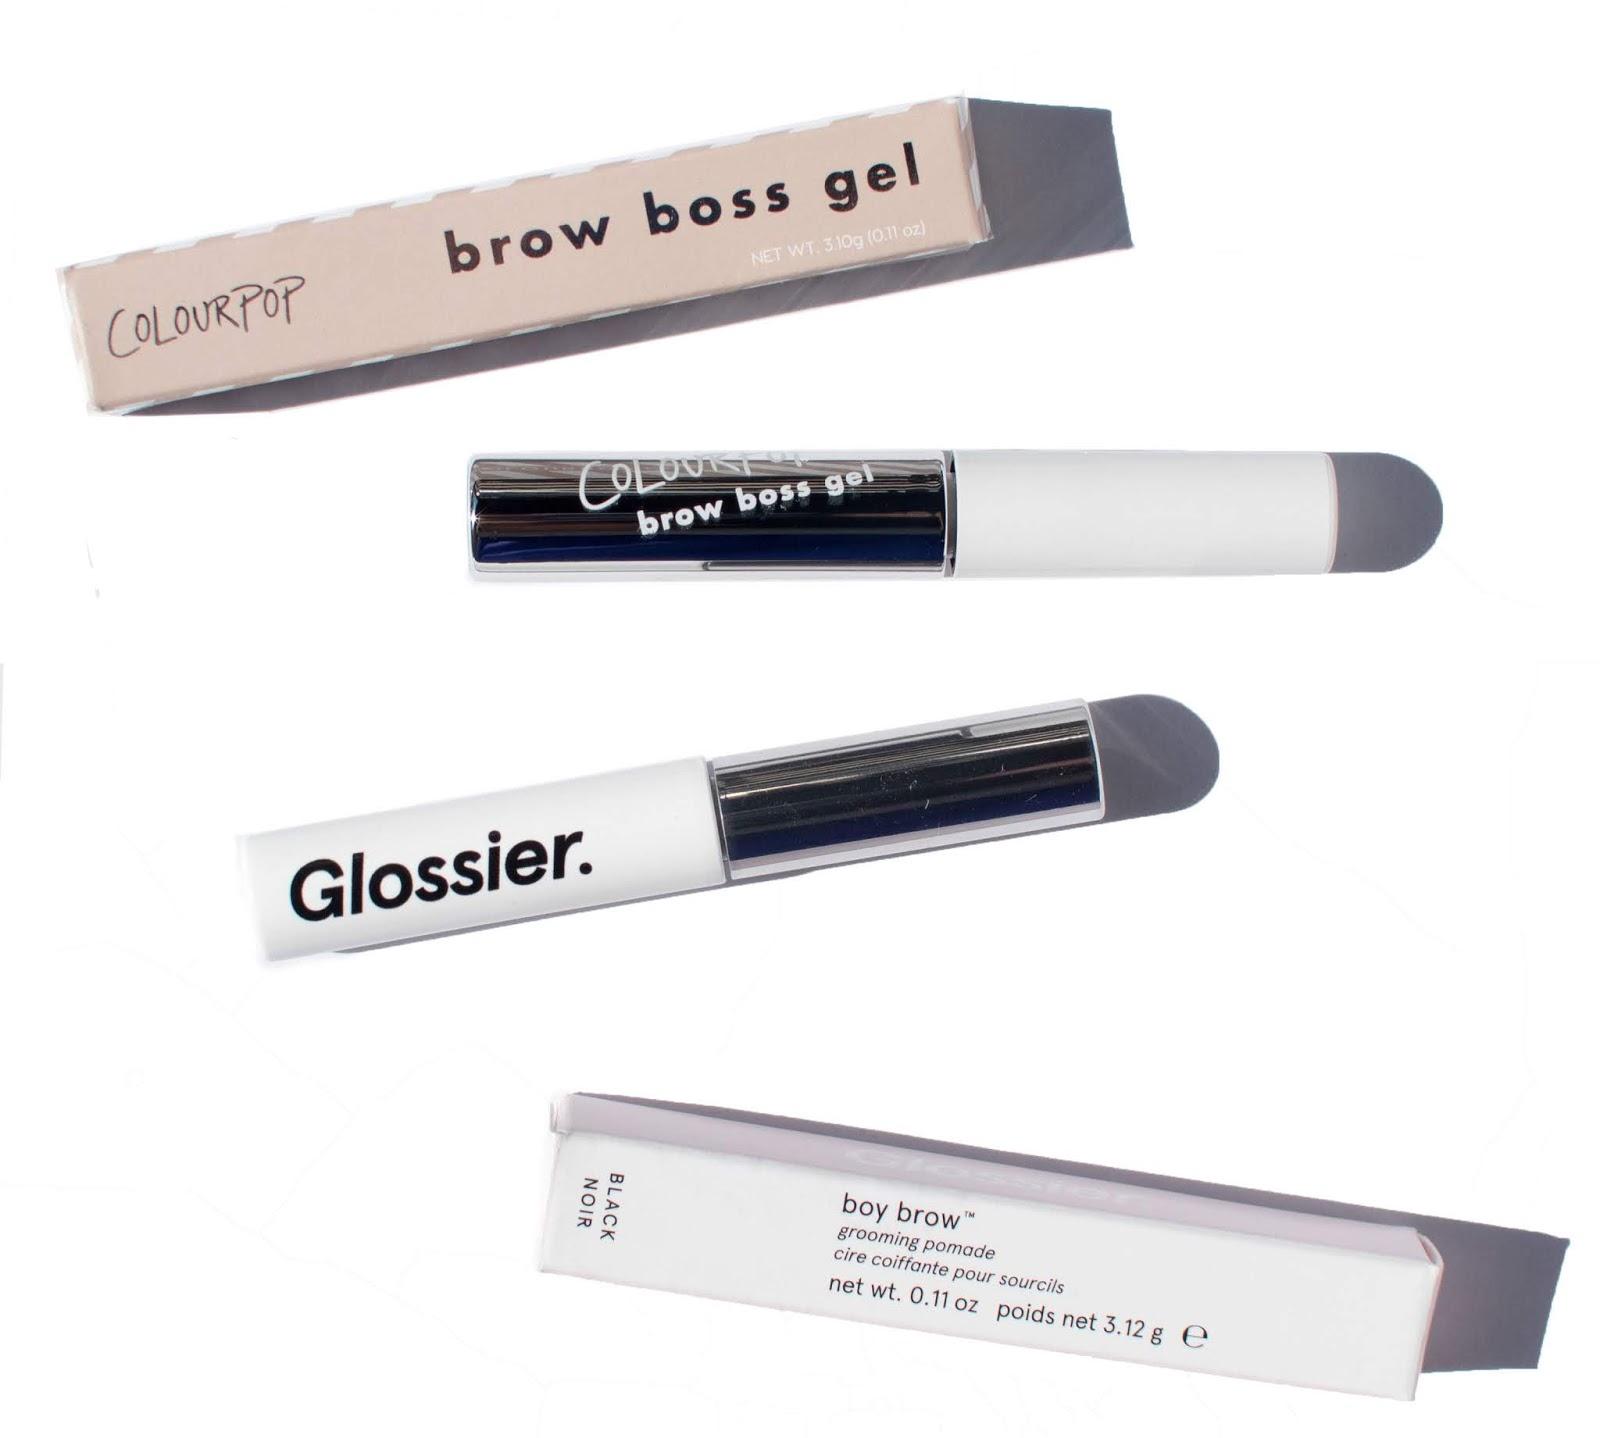 colourpop brow boss gel vs glossier boy brow comparison swatches